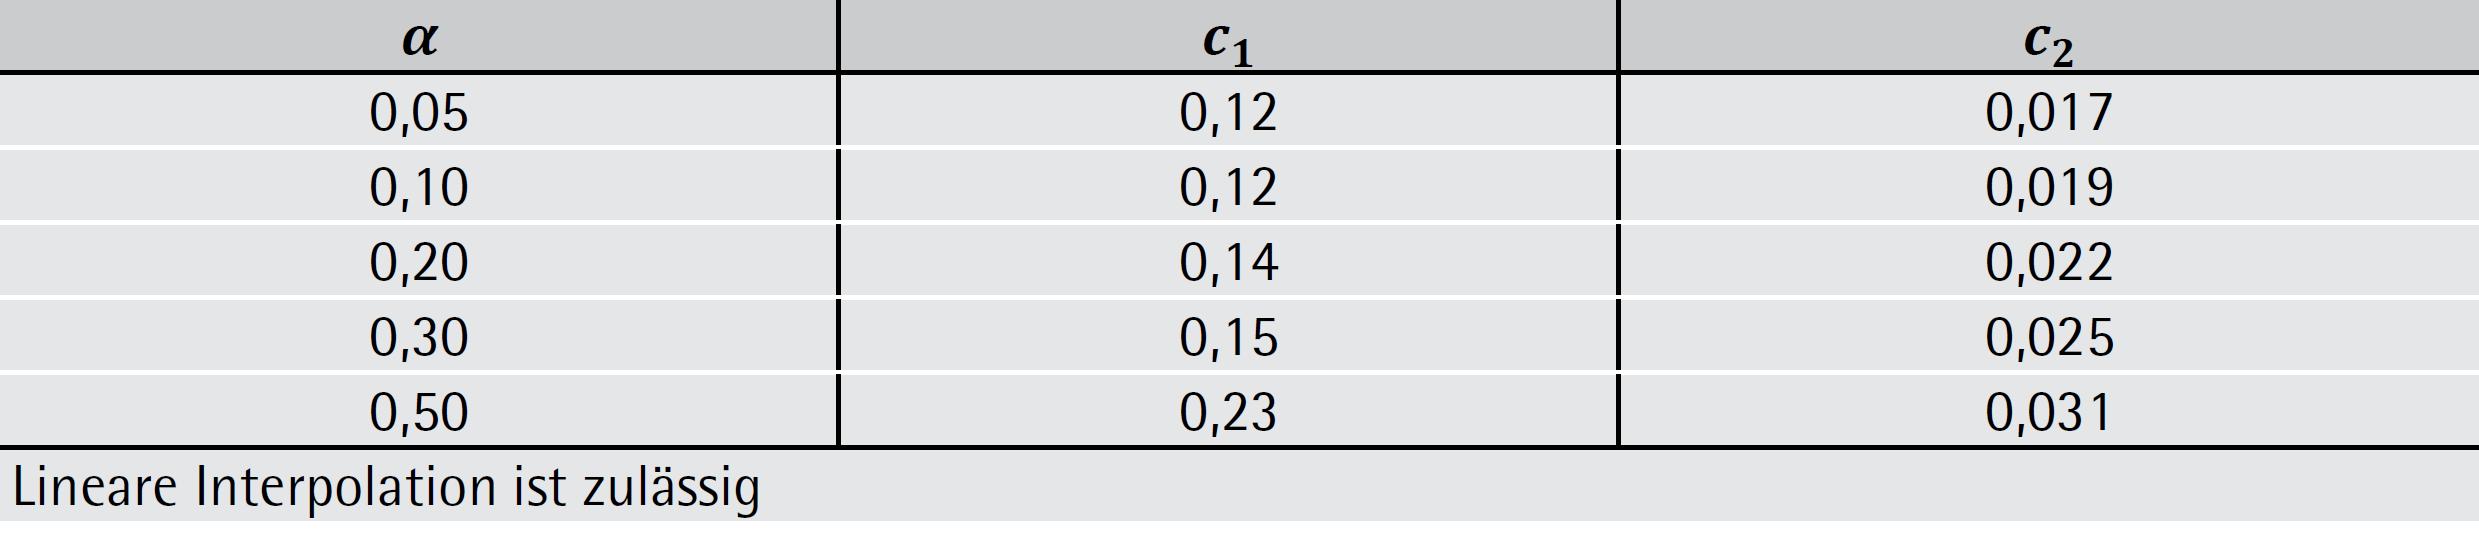 Tabelle 6-42: Konstanten c1 und c2 – ÖNORM EN 1996-3